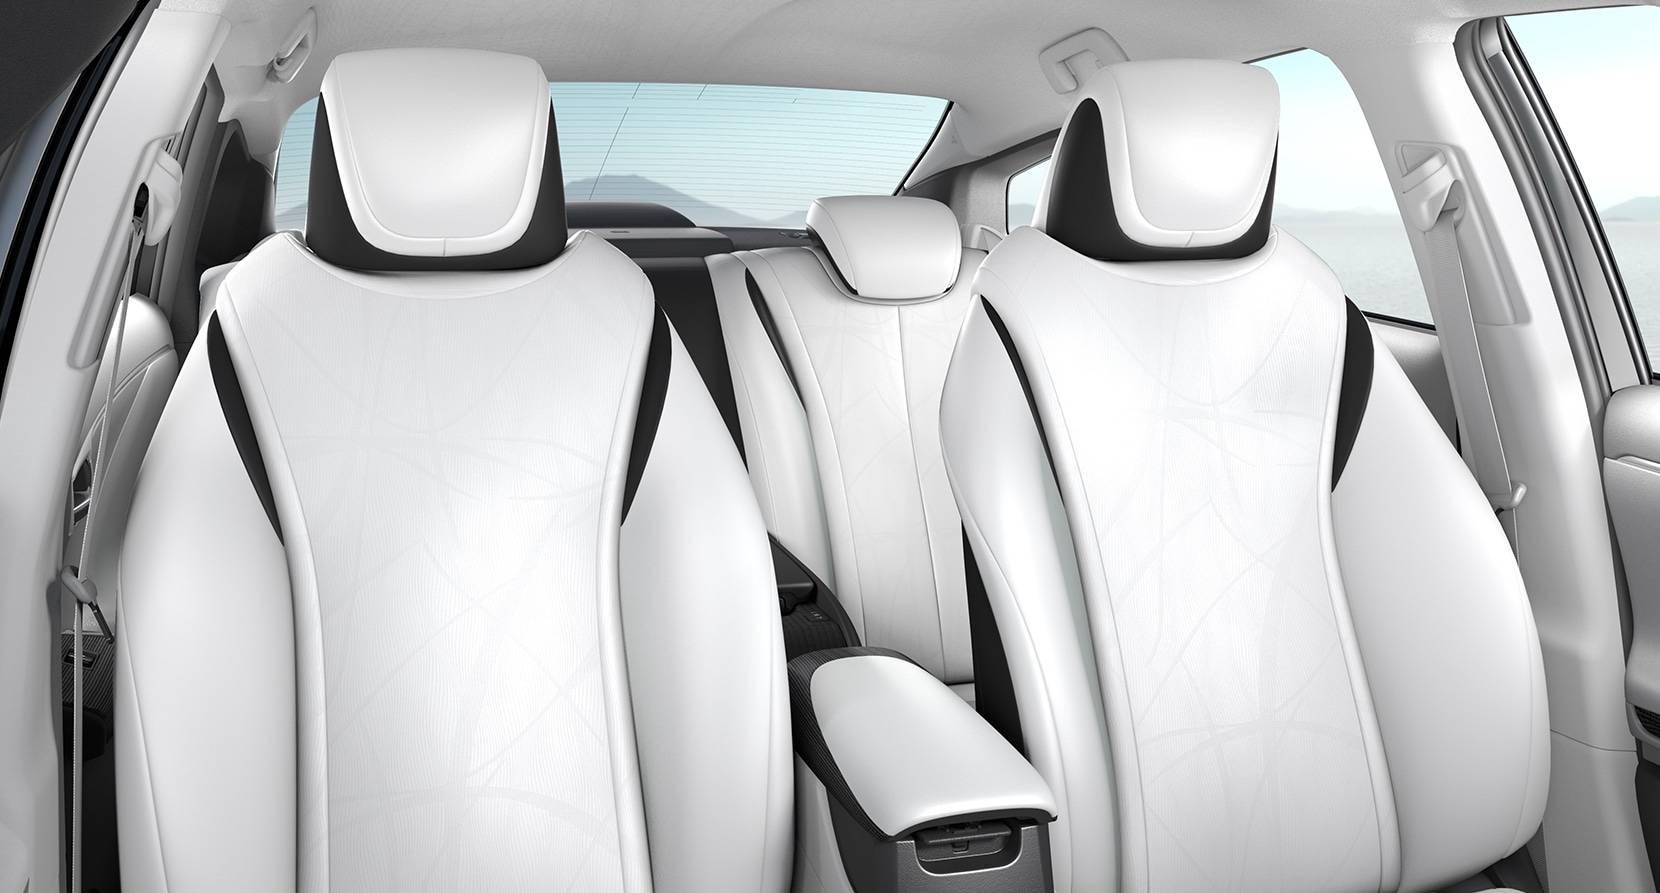 2017 Toyota Mirai SofTex Seats With Power Lumbar